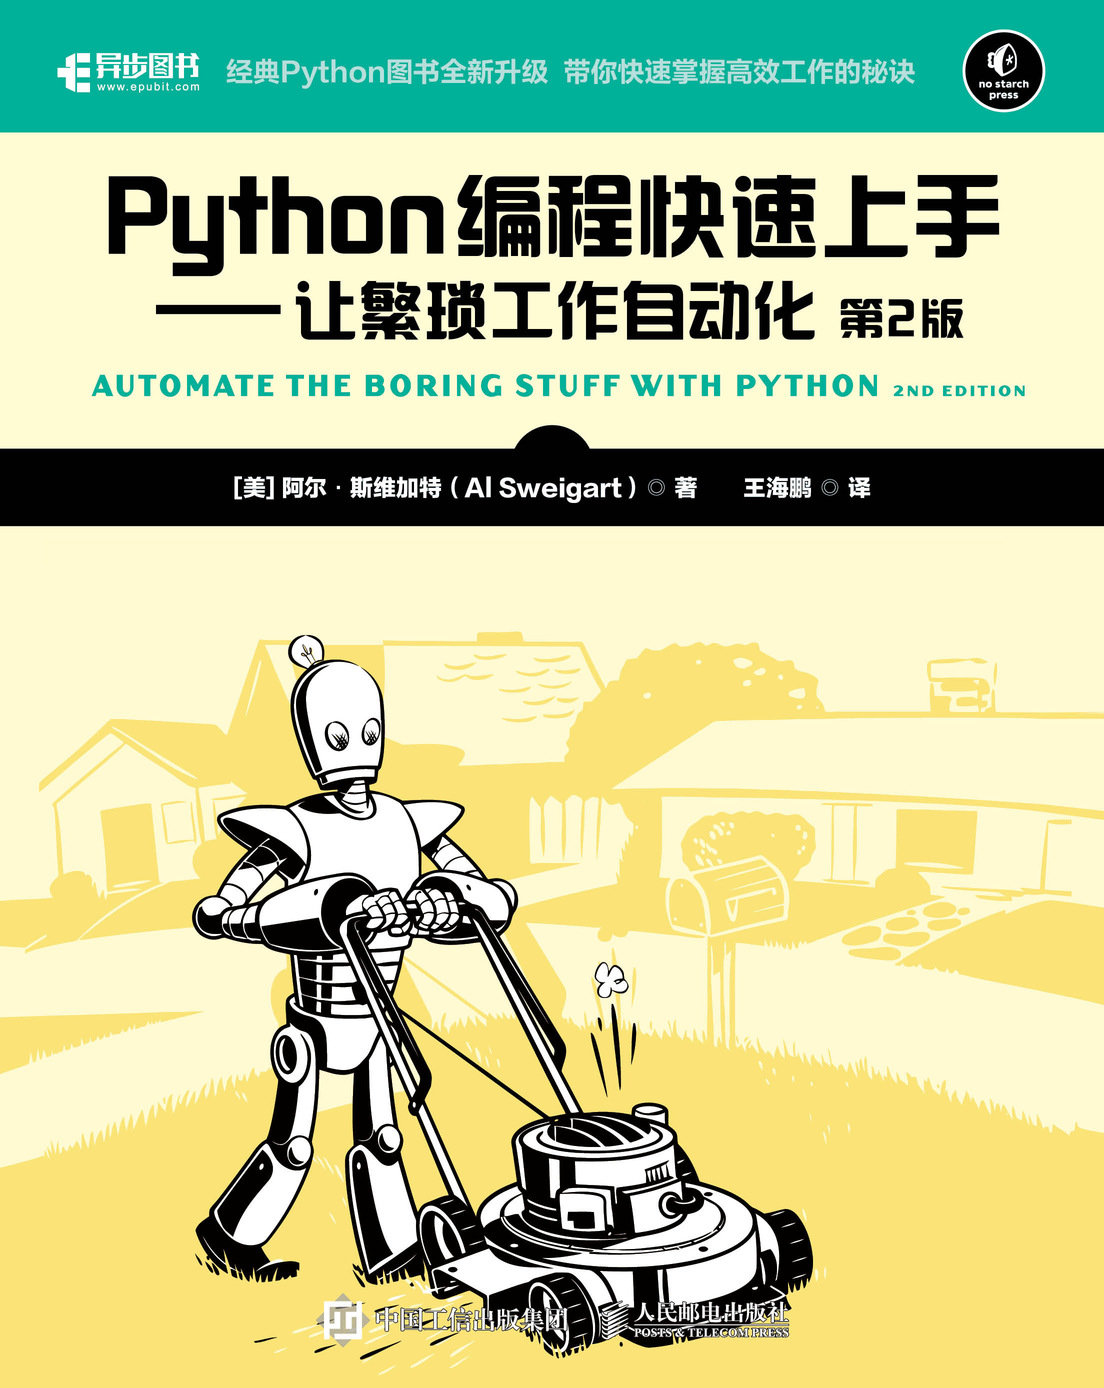 Python編程快速上手 讓繁瑣工作自動化 第2版-preview-1